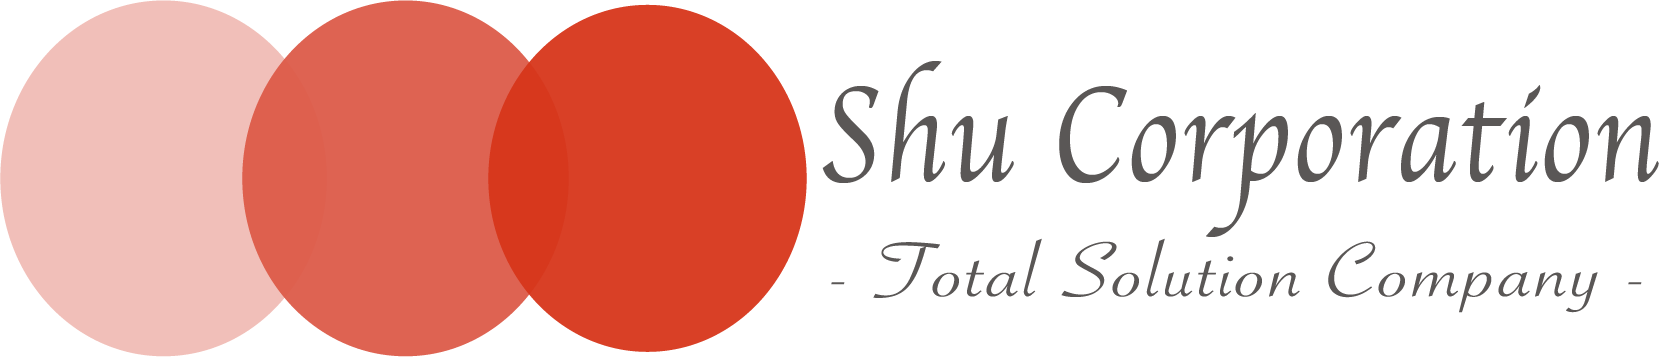 Shu Corporation